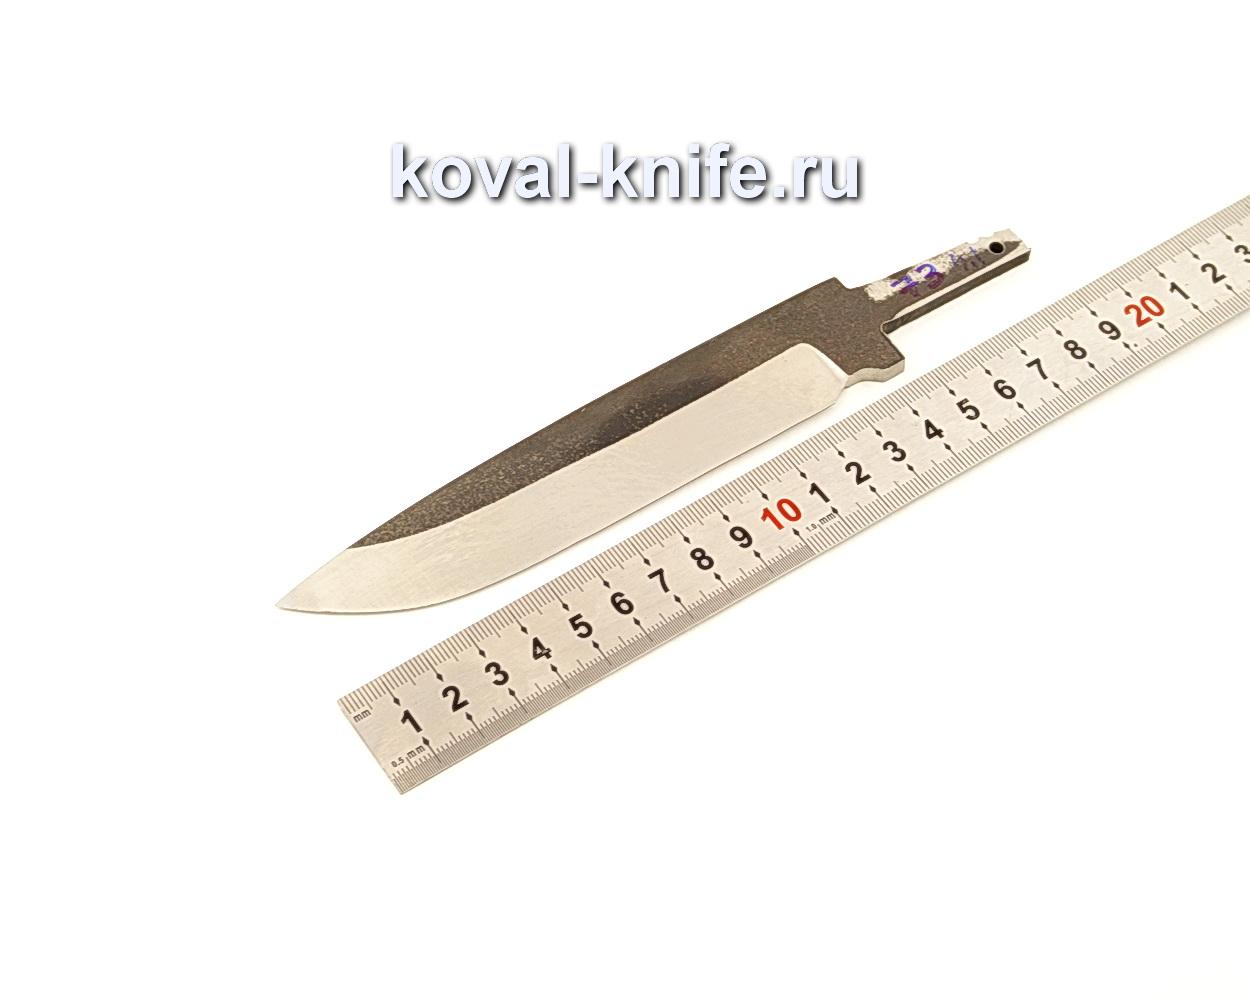 Клинок для ножа из кованой 95Х18 N73